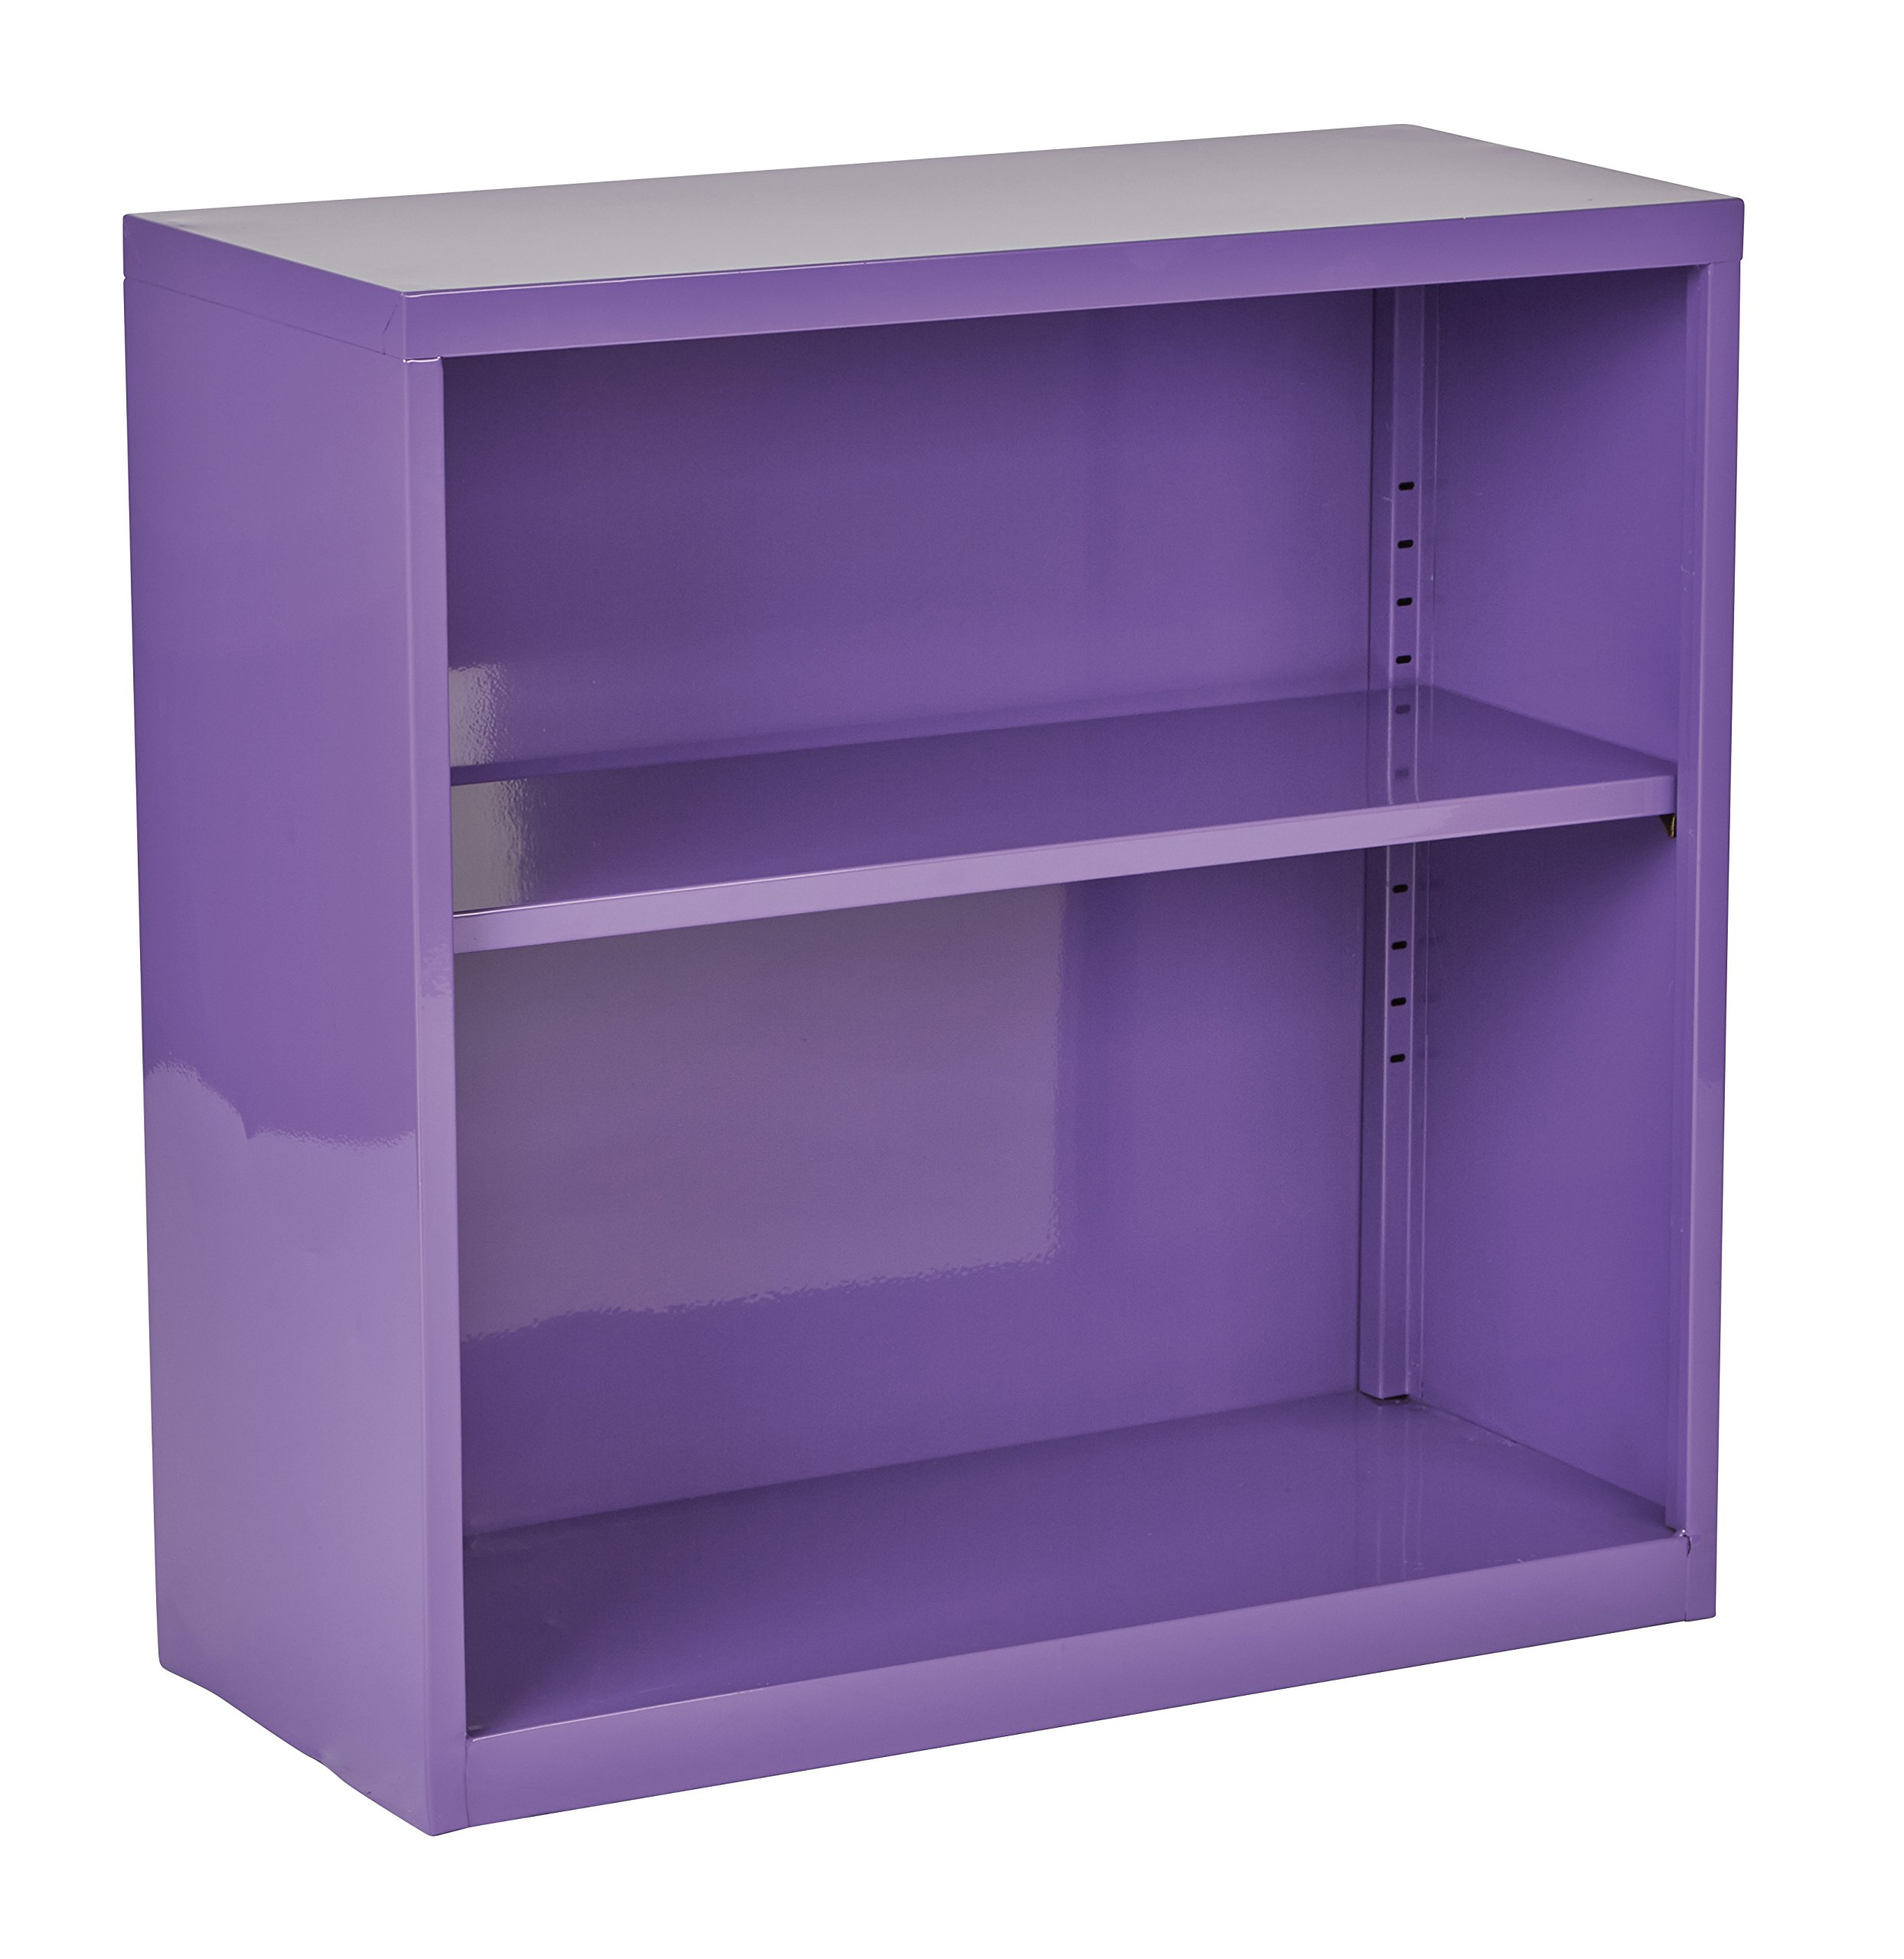 OSP Designs Metal Bookcase, Purple